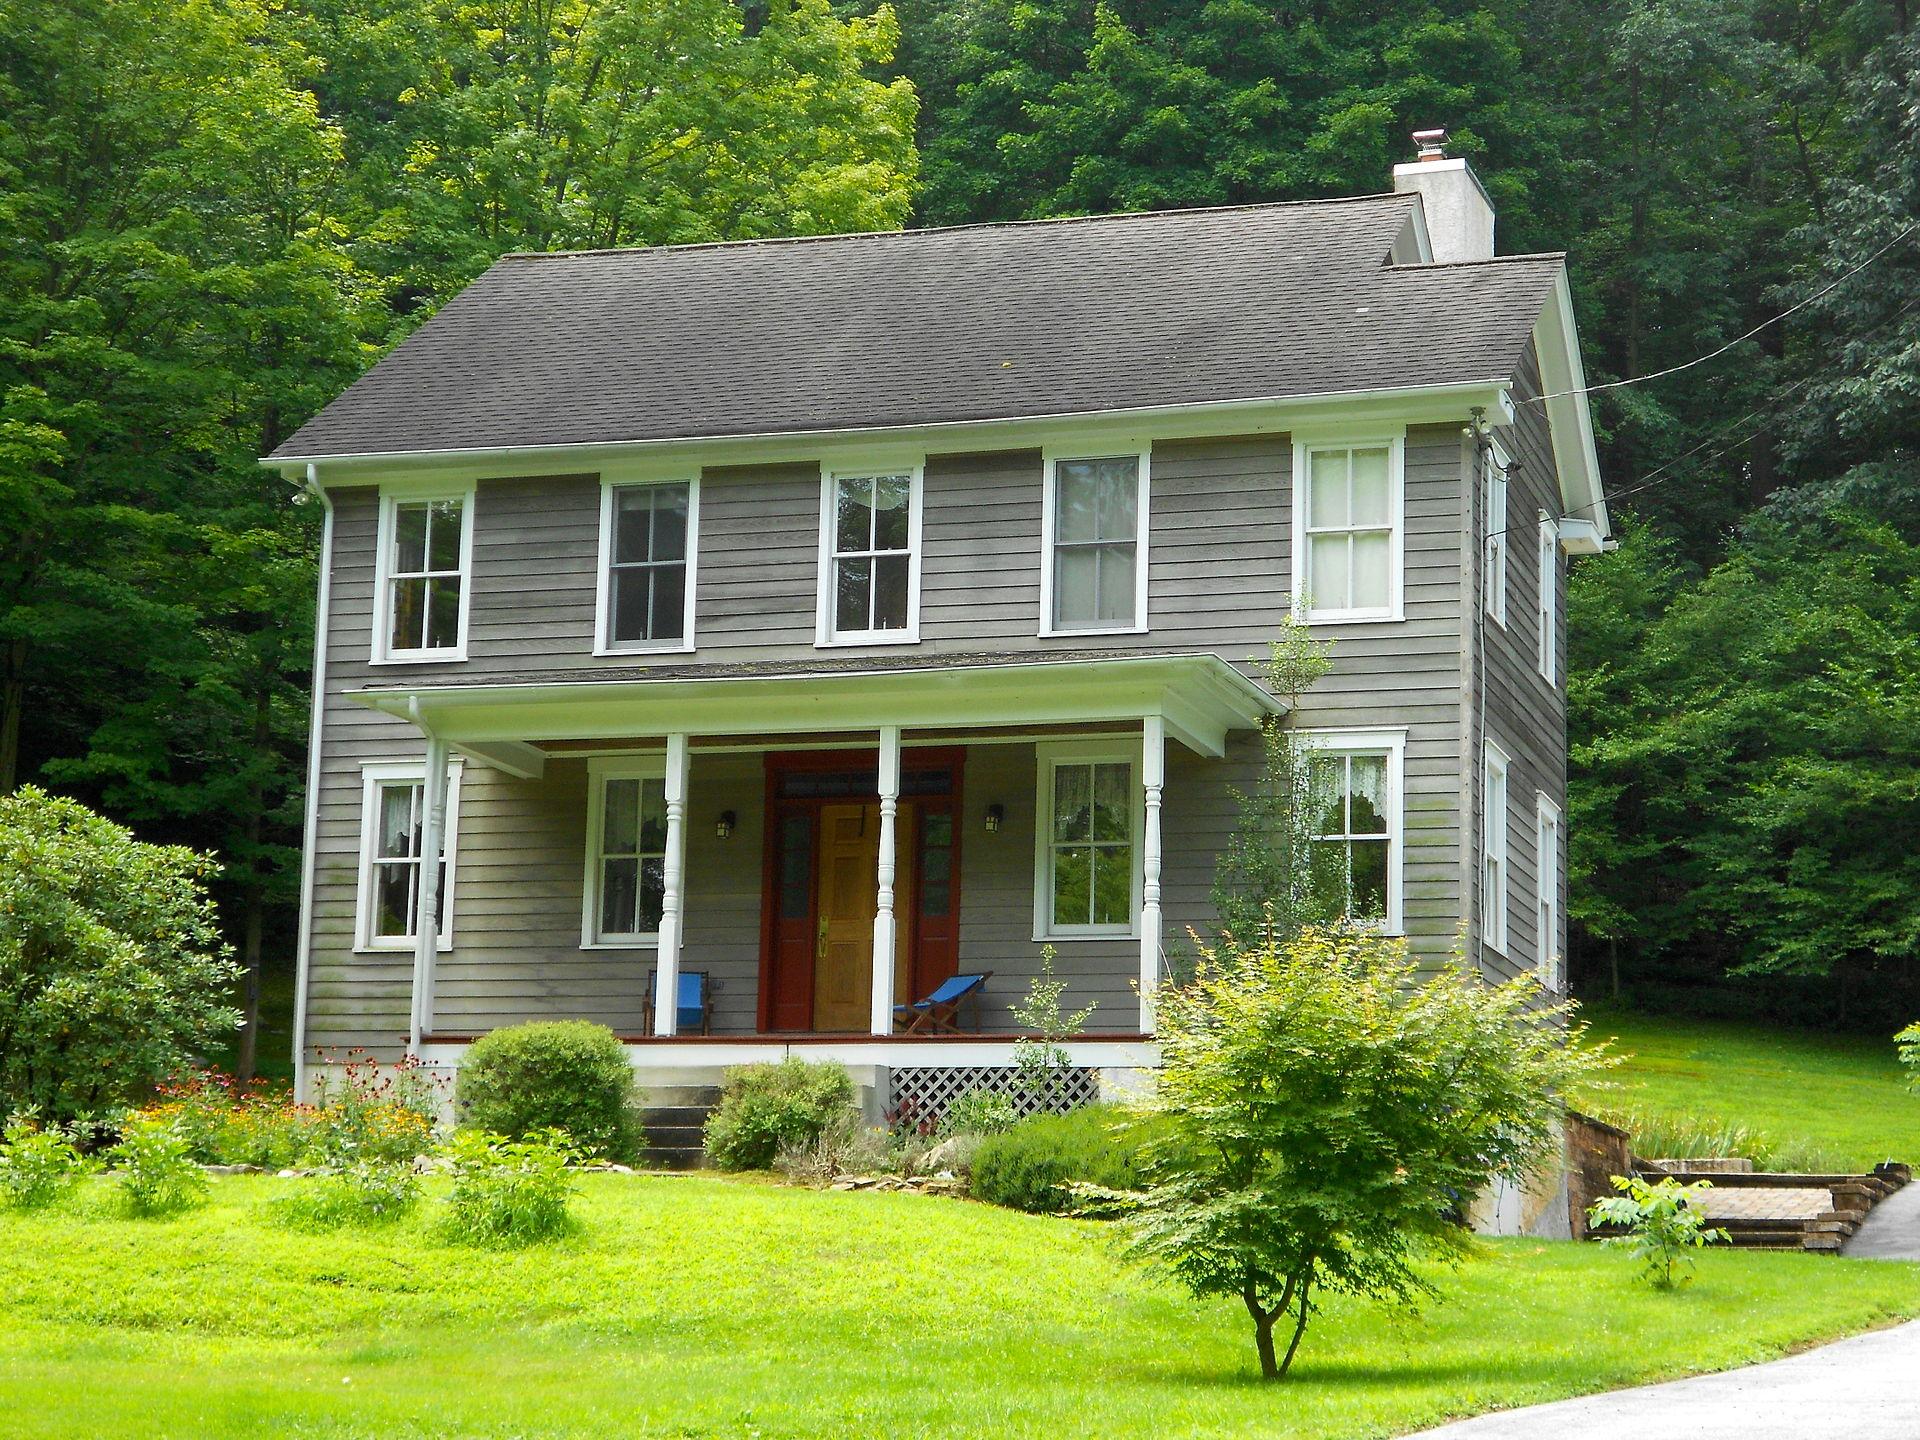 Wilkinson house pocopson township pennsylvania wikipedia for Wilkinson homes